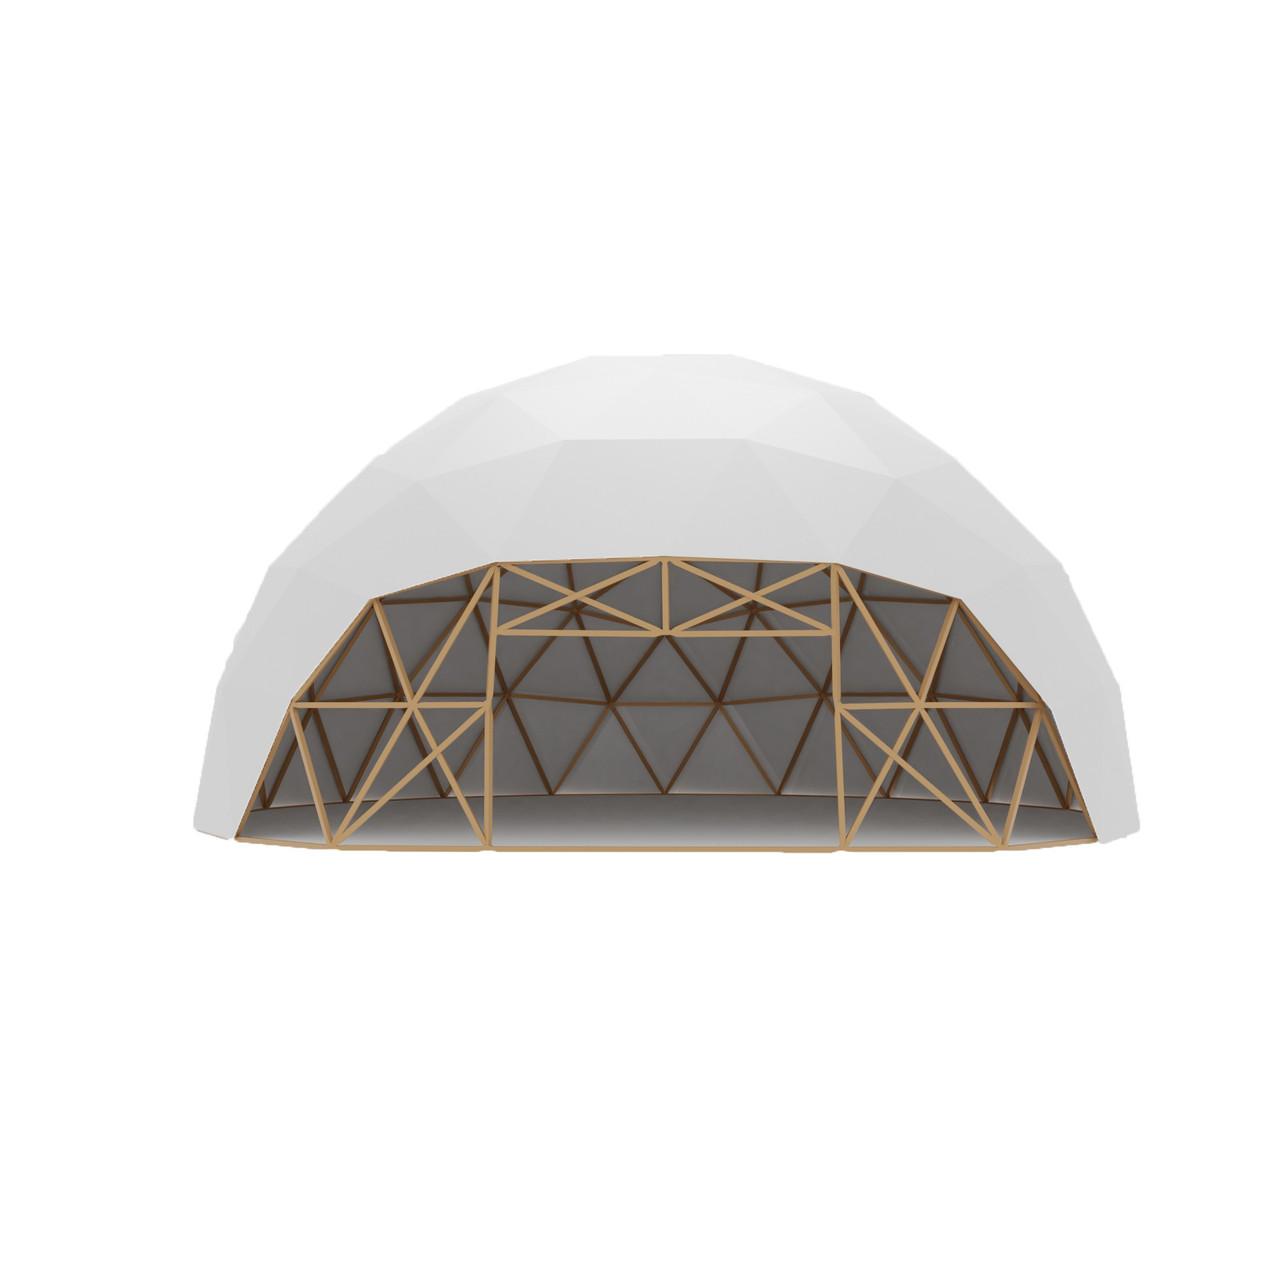 Сферический шатер диаметр 16 м